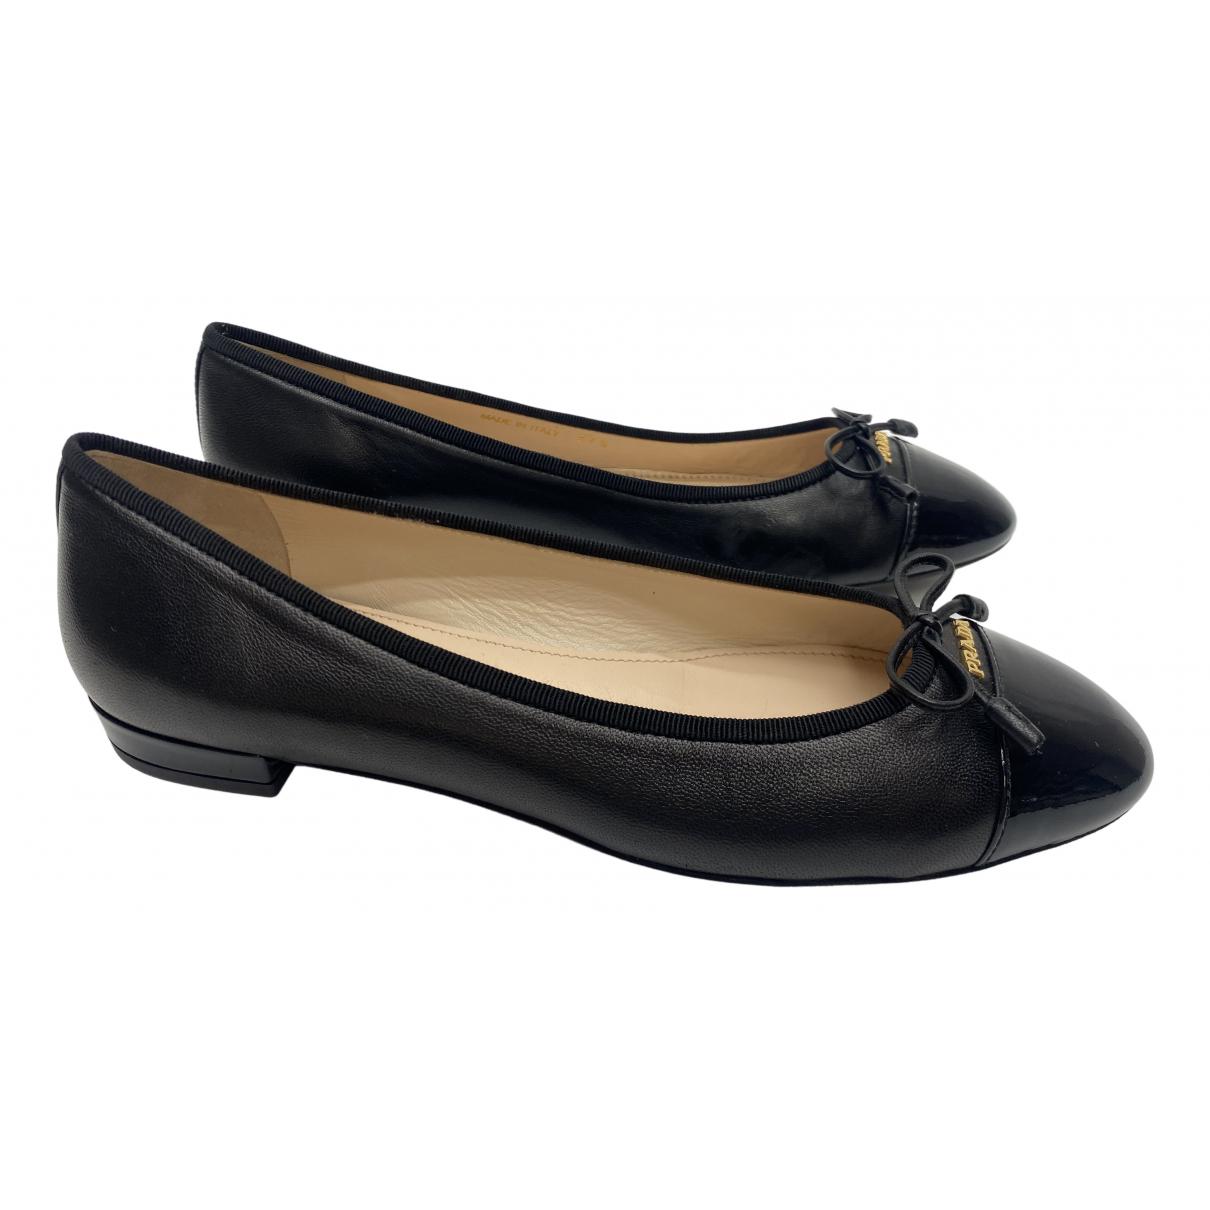 Prada \N Black Leather Ballet flats for Women 37.5 IT